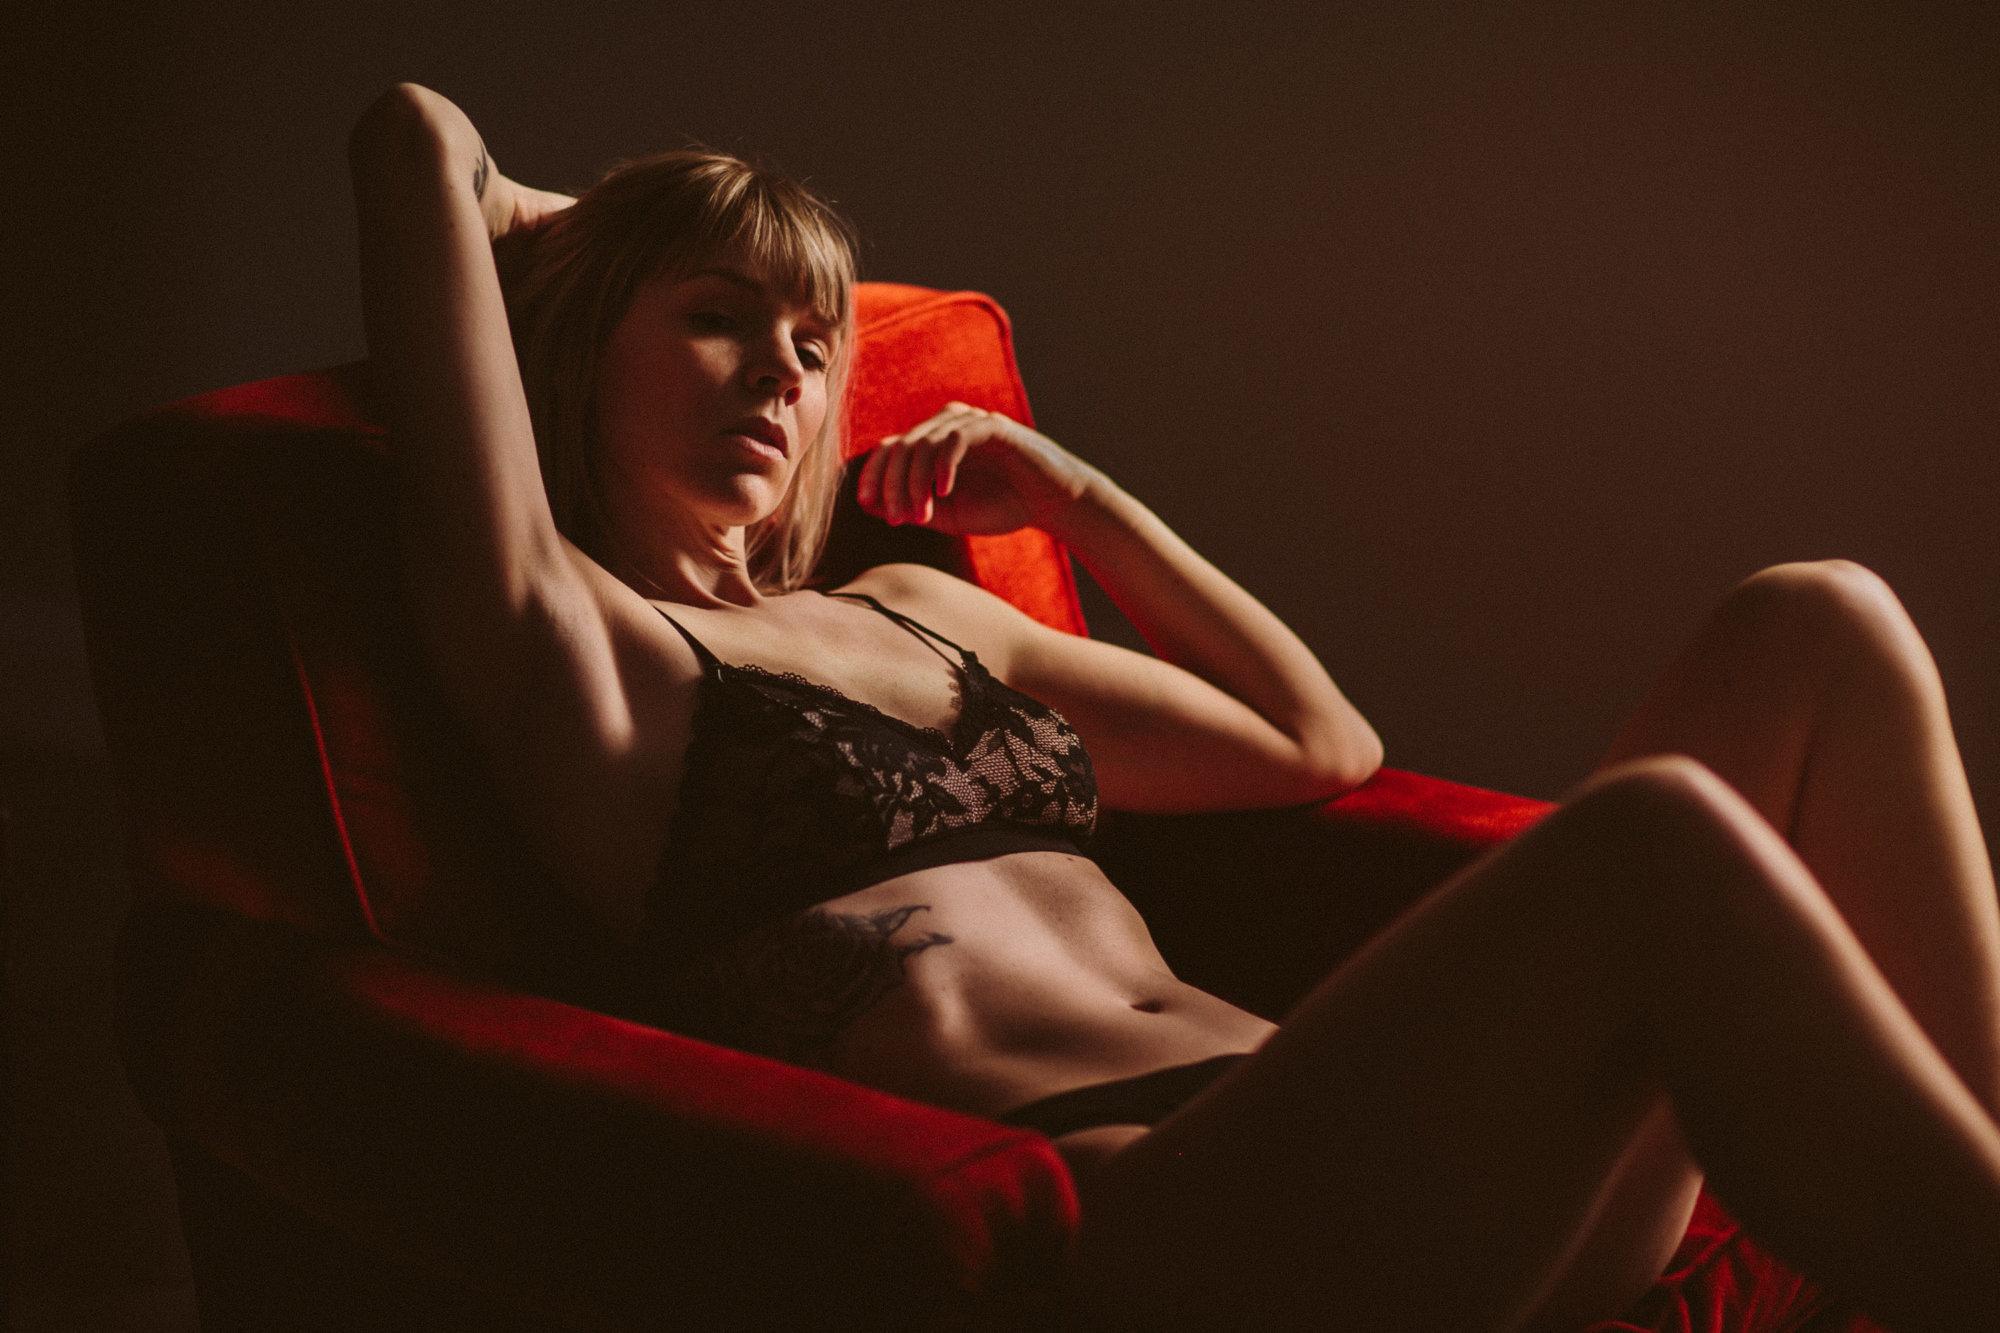 Seks dwóch kobiet – na czym polega lesbijski seks